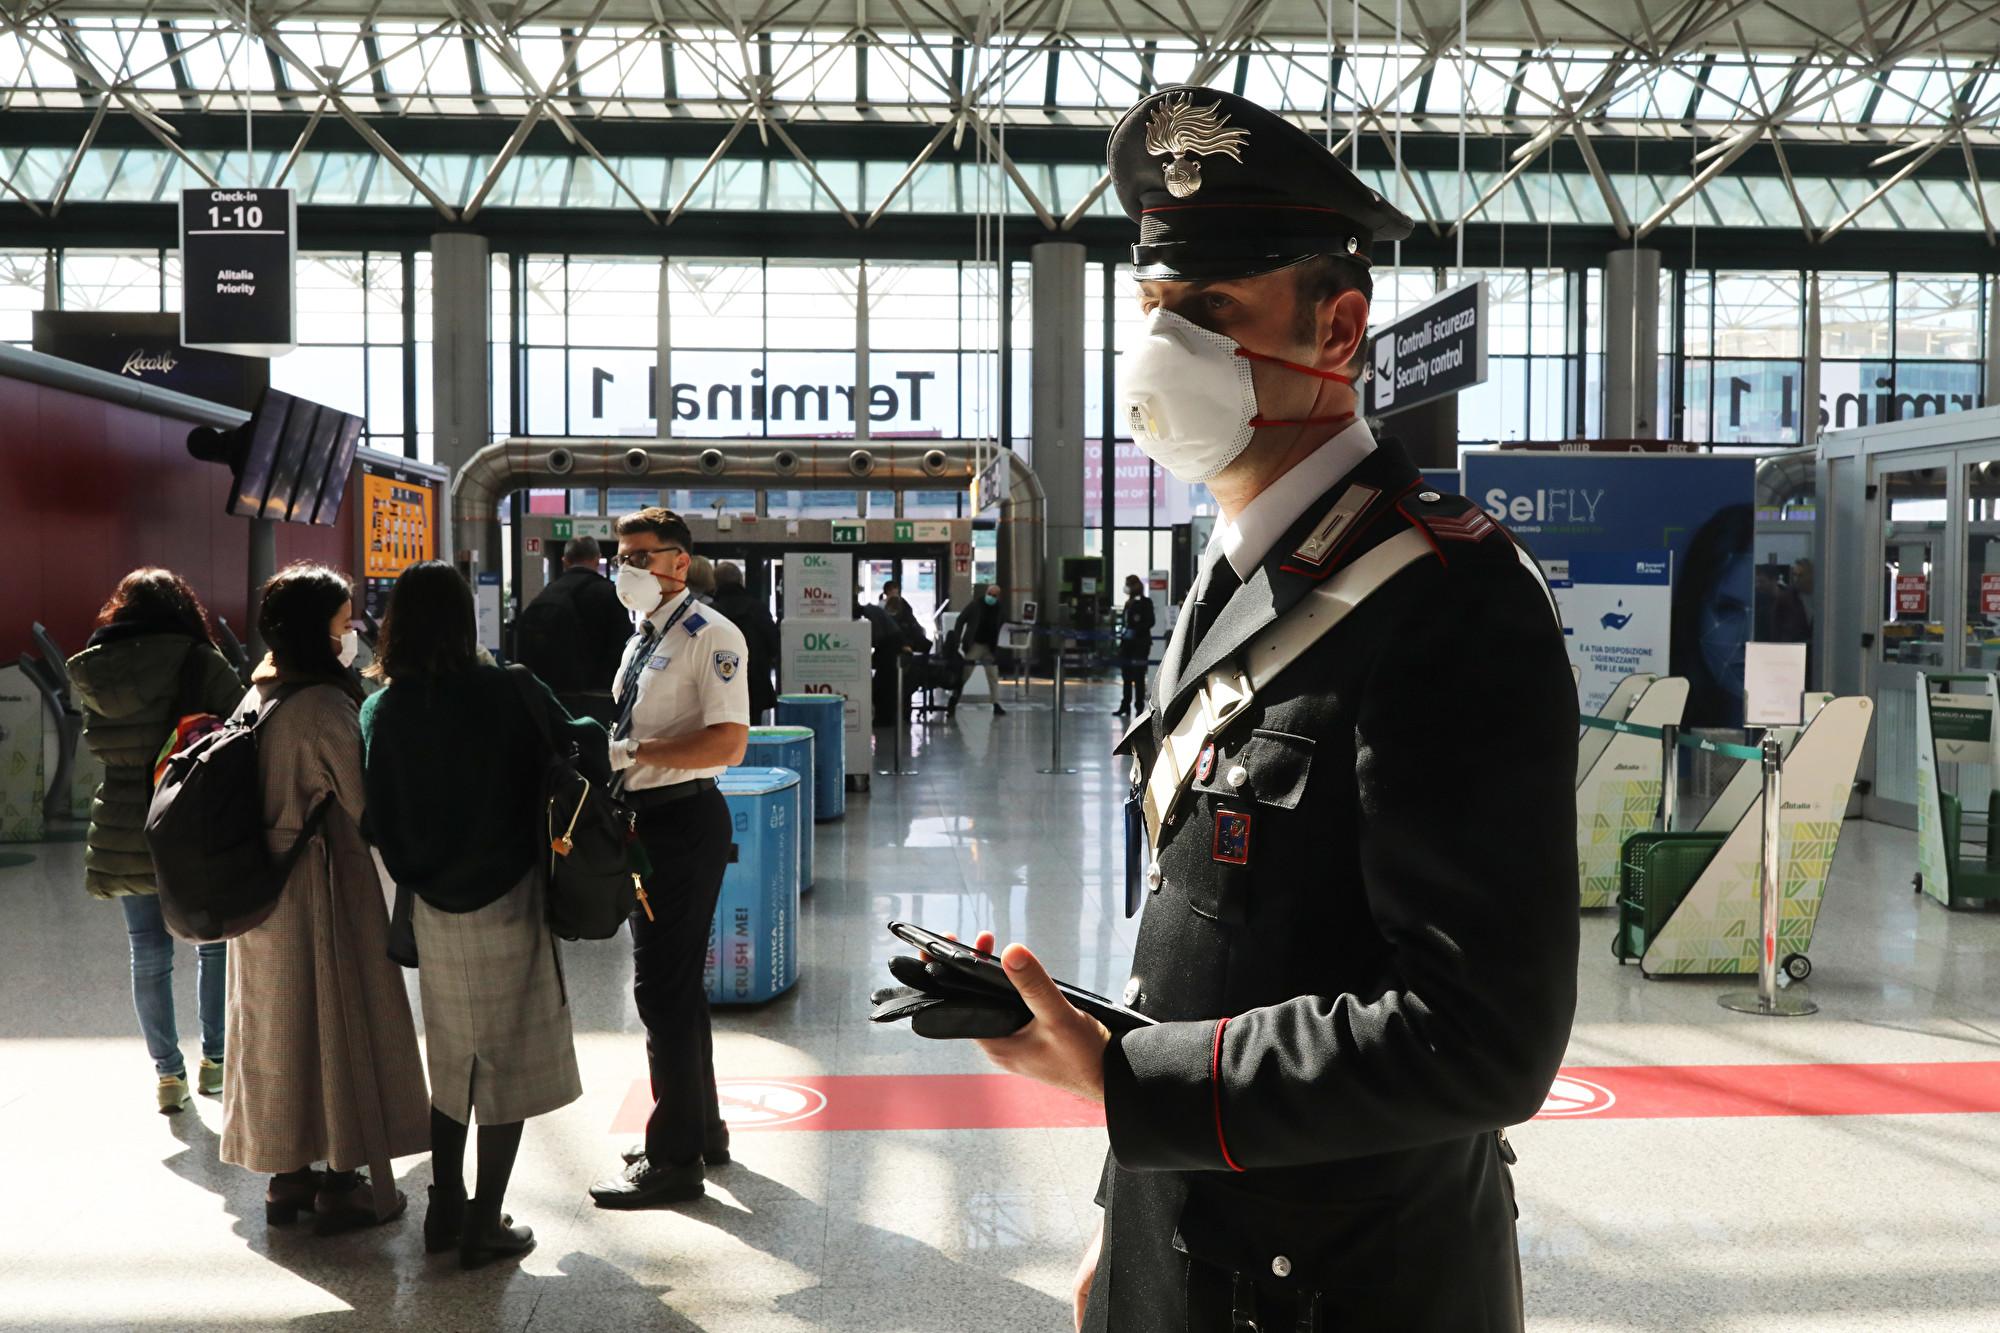 2020年3月12日,意大利羅馬菲烏米奇諾(Fiumicino)機場的準軍事警察。(Marco Di Lauro/Getty Images)